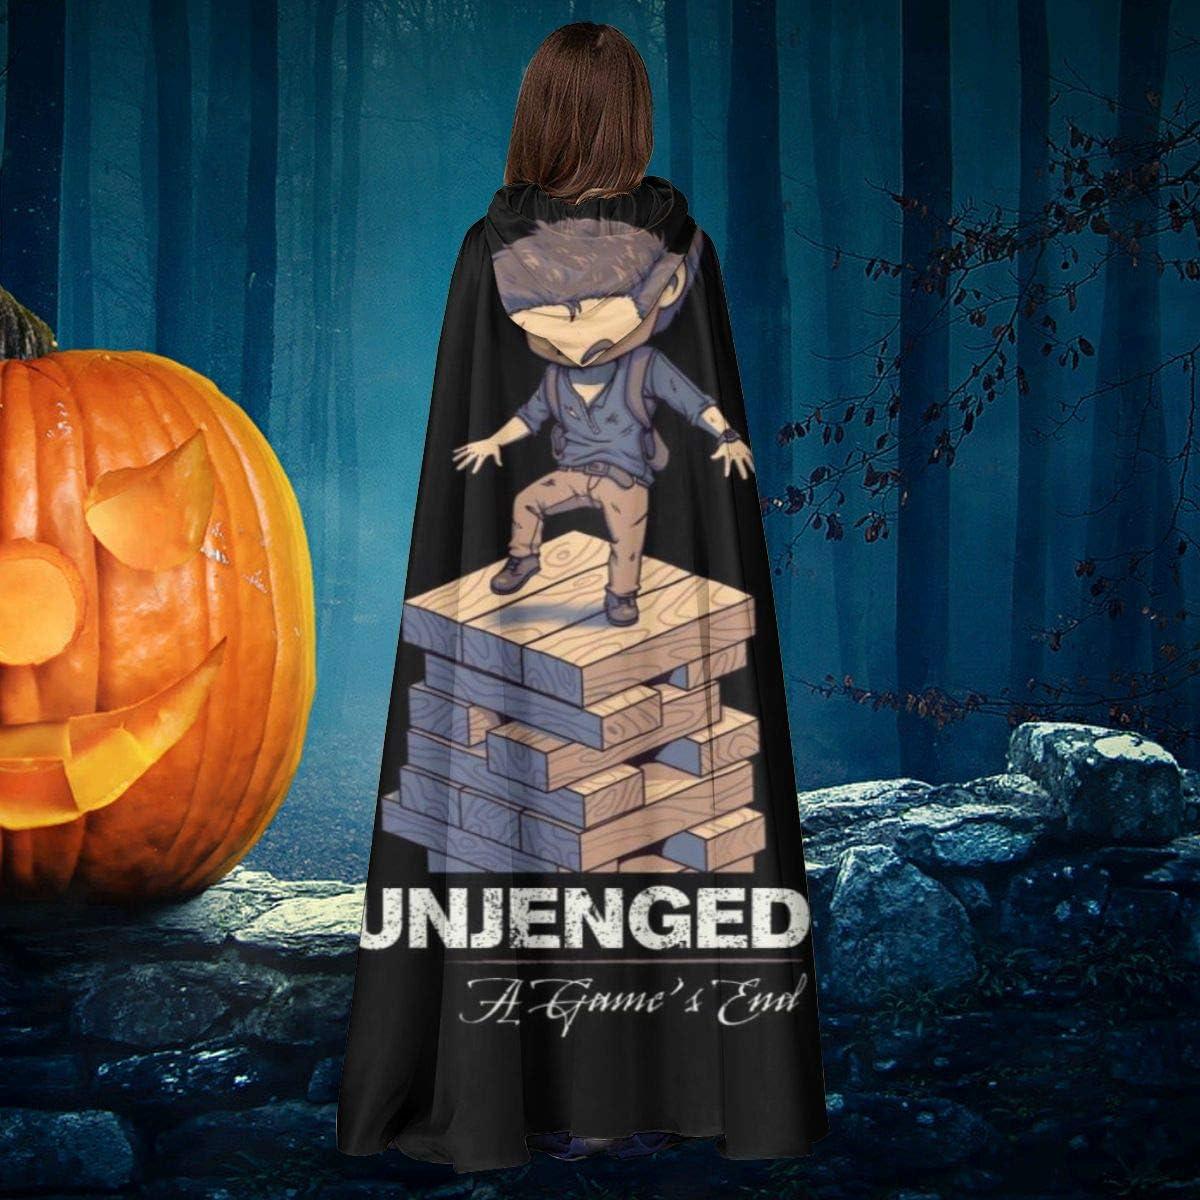 AISFGBJ Unjenged Jenga Uncharted Unisex Navidad Halloween Bruja Caballero con Capucha Bata de Vampiro Capa de Disfraz de Cosplay: Amazon.es: Productos para mascotas